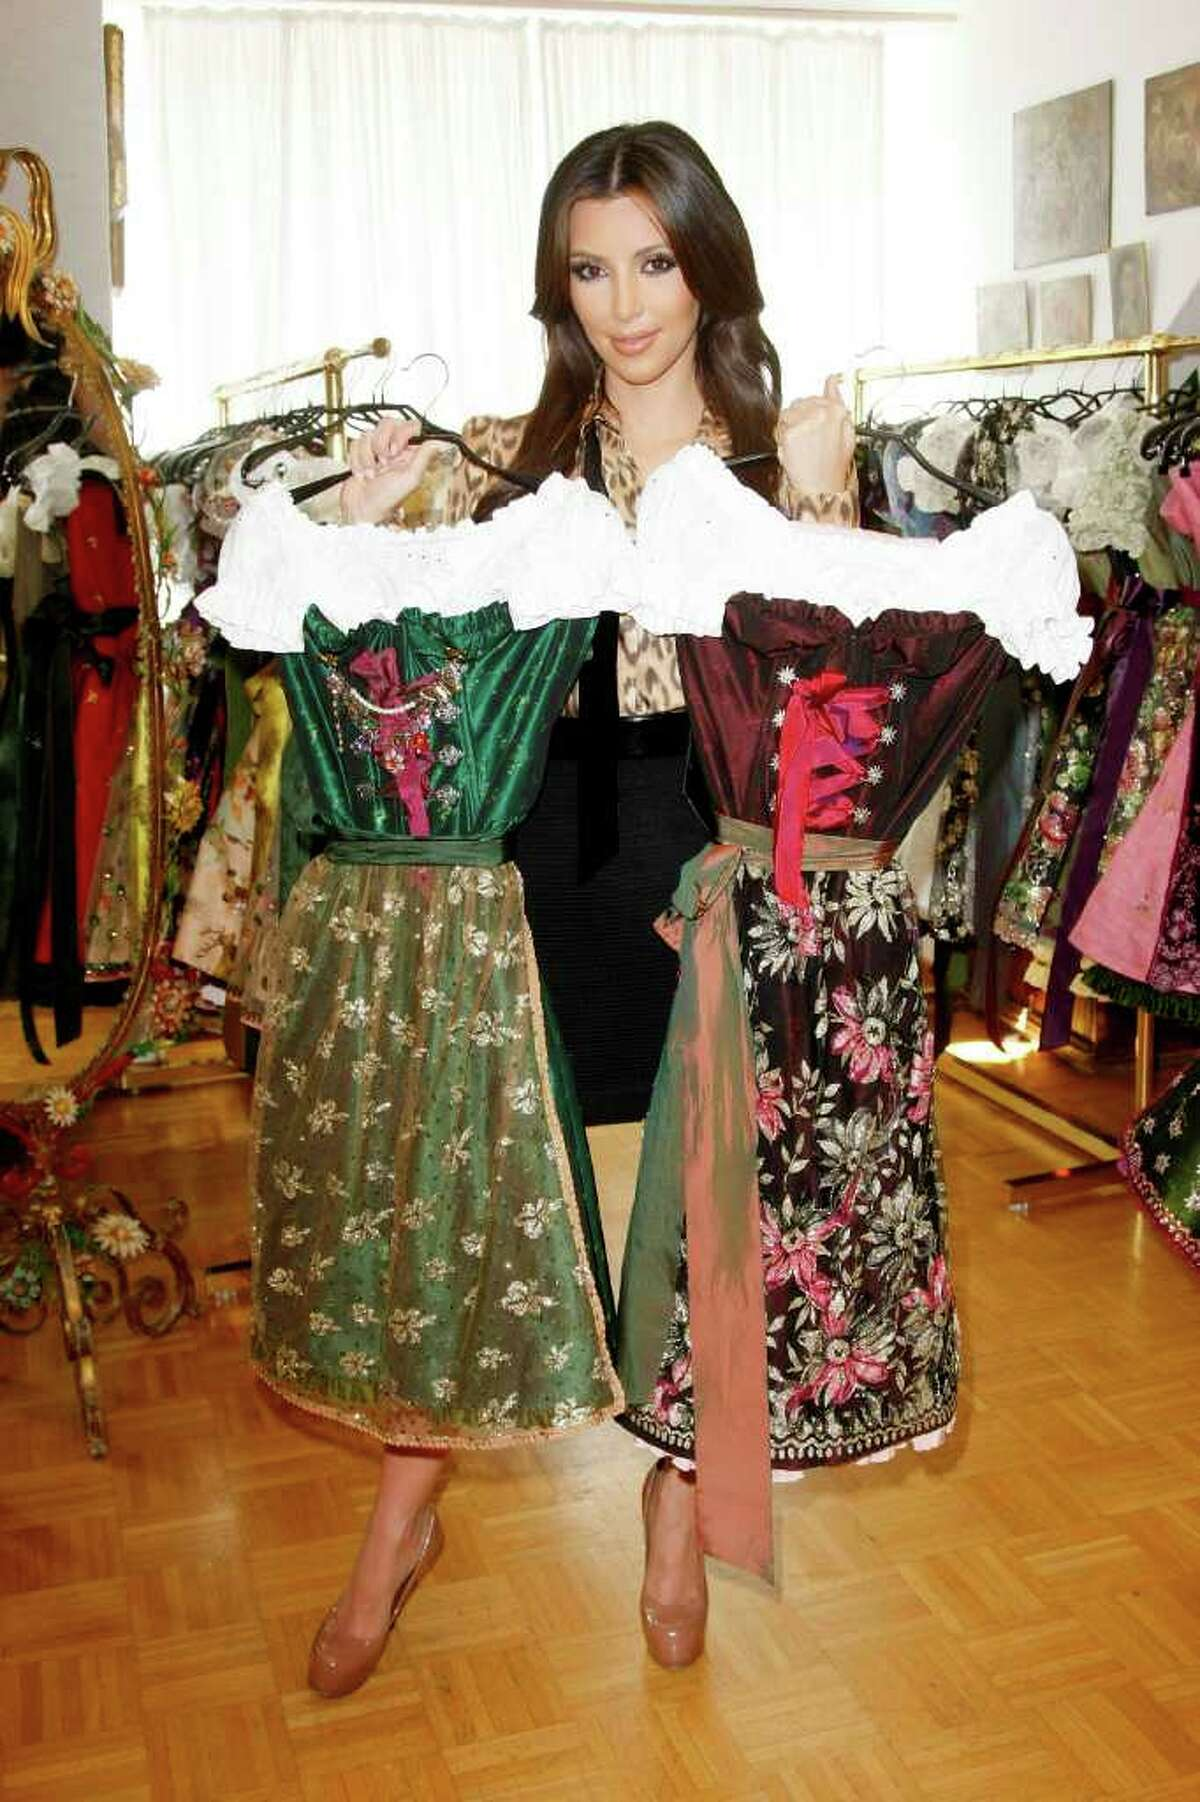 MUNICH, GERMANY - SEPTEMBER 22: Kim Kardashian attends the dirndl/dress fitting for her visit of the Oktoberfest 2010 at Lola Paltinger, Lollipop & Alpenrock store during her Munich Visit on September 22, 2010 in Munich, Germany. (Photo by Florian Seefried/Getty Images) *** Local Caption *** Kim Kardashian